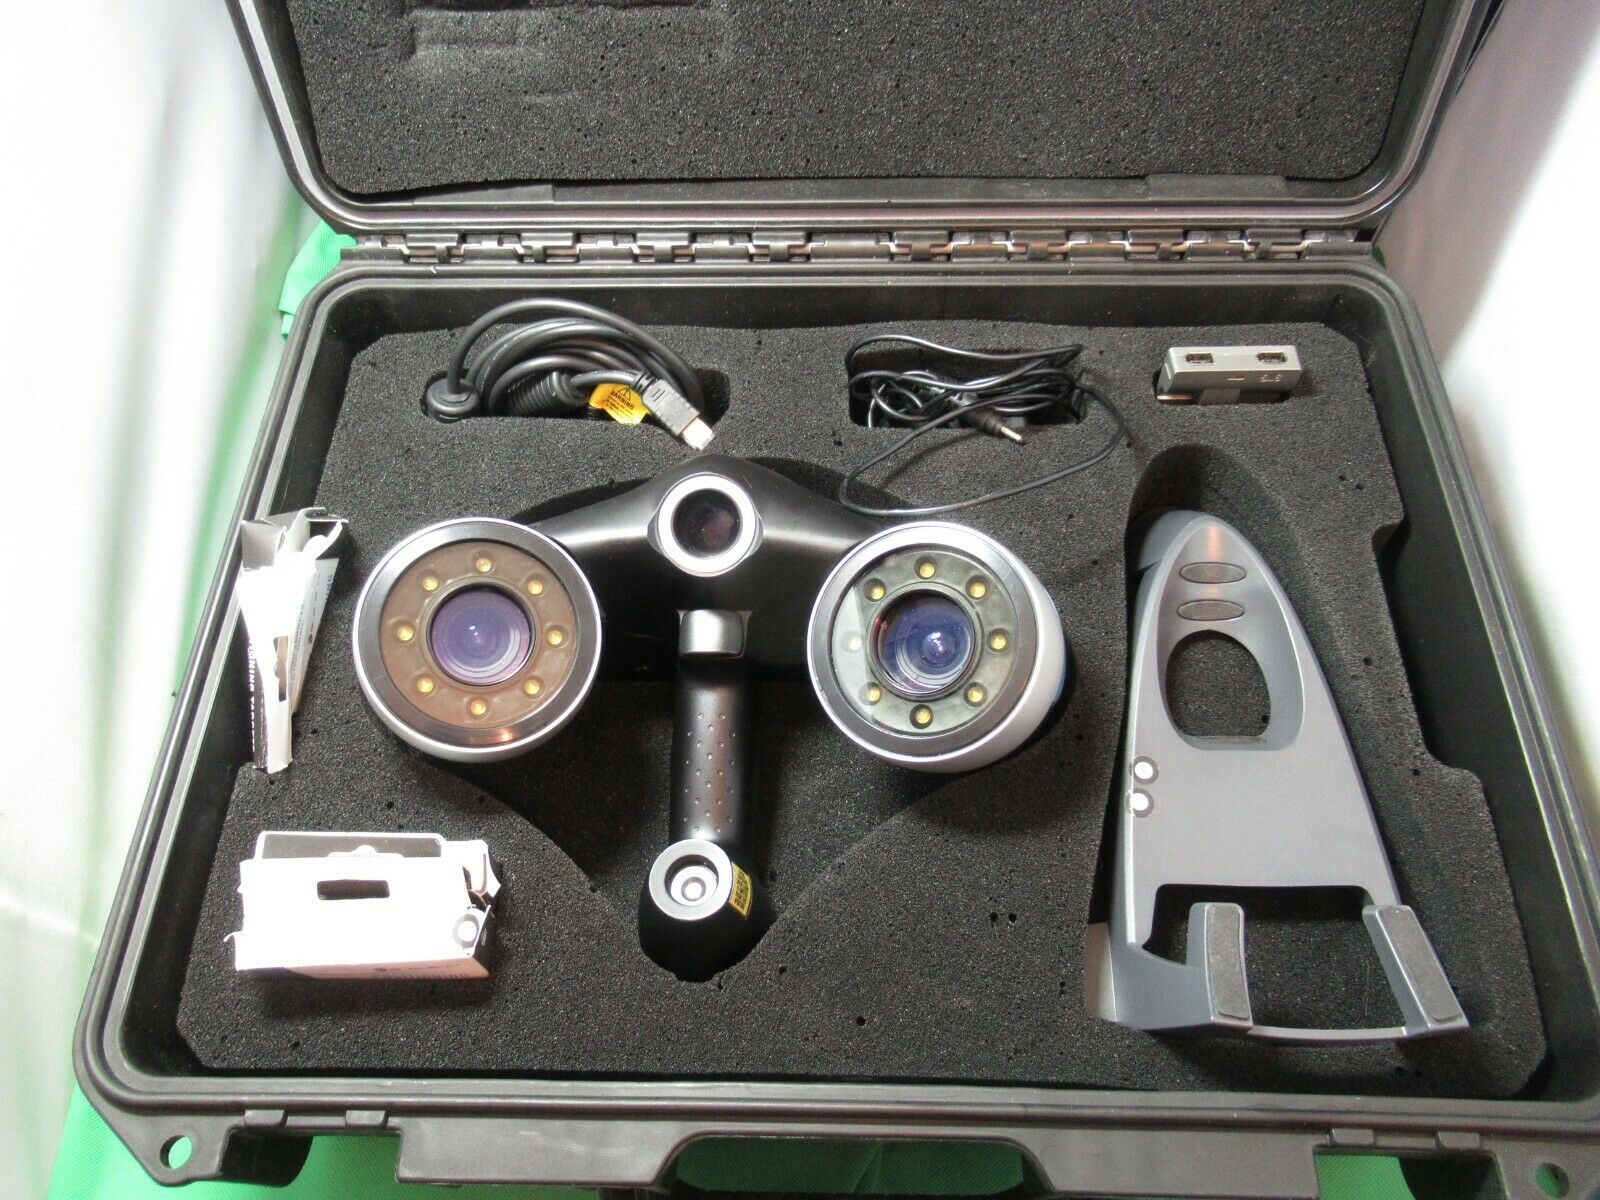 HandyScan VIUscan 700CX